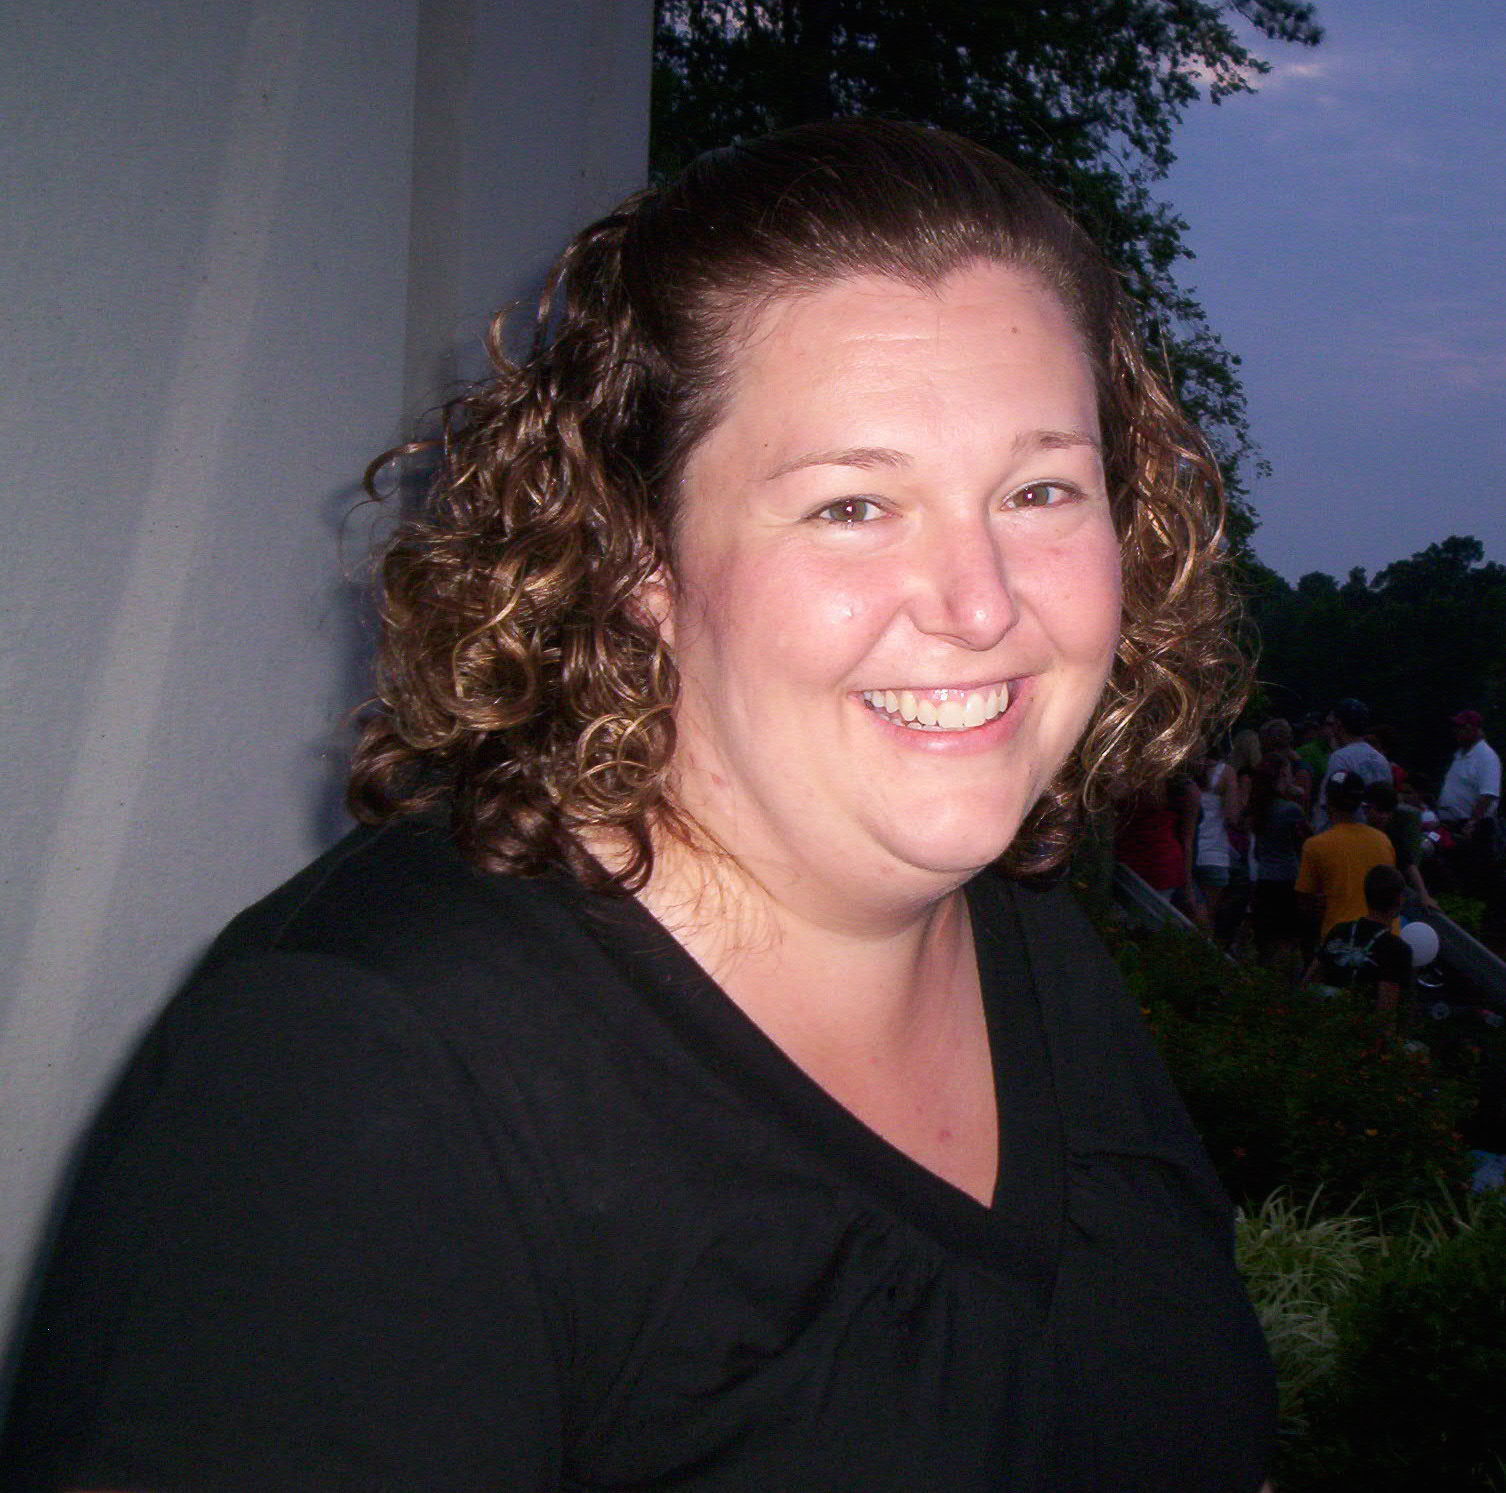 Shanna Jordan, M.S., CCC-SLP Speech-Language Pathologist